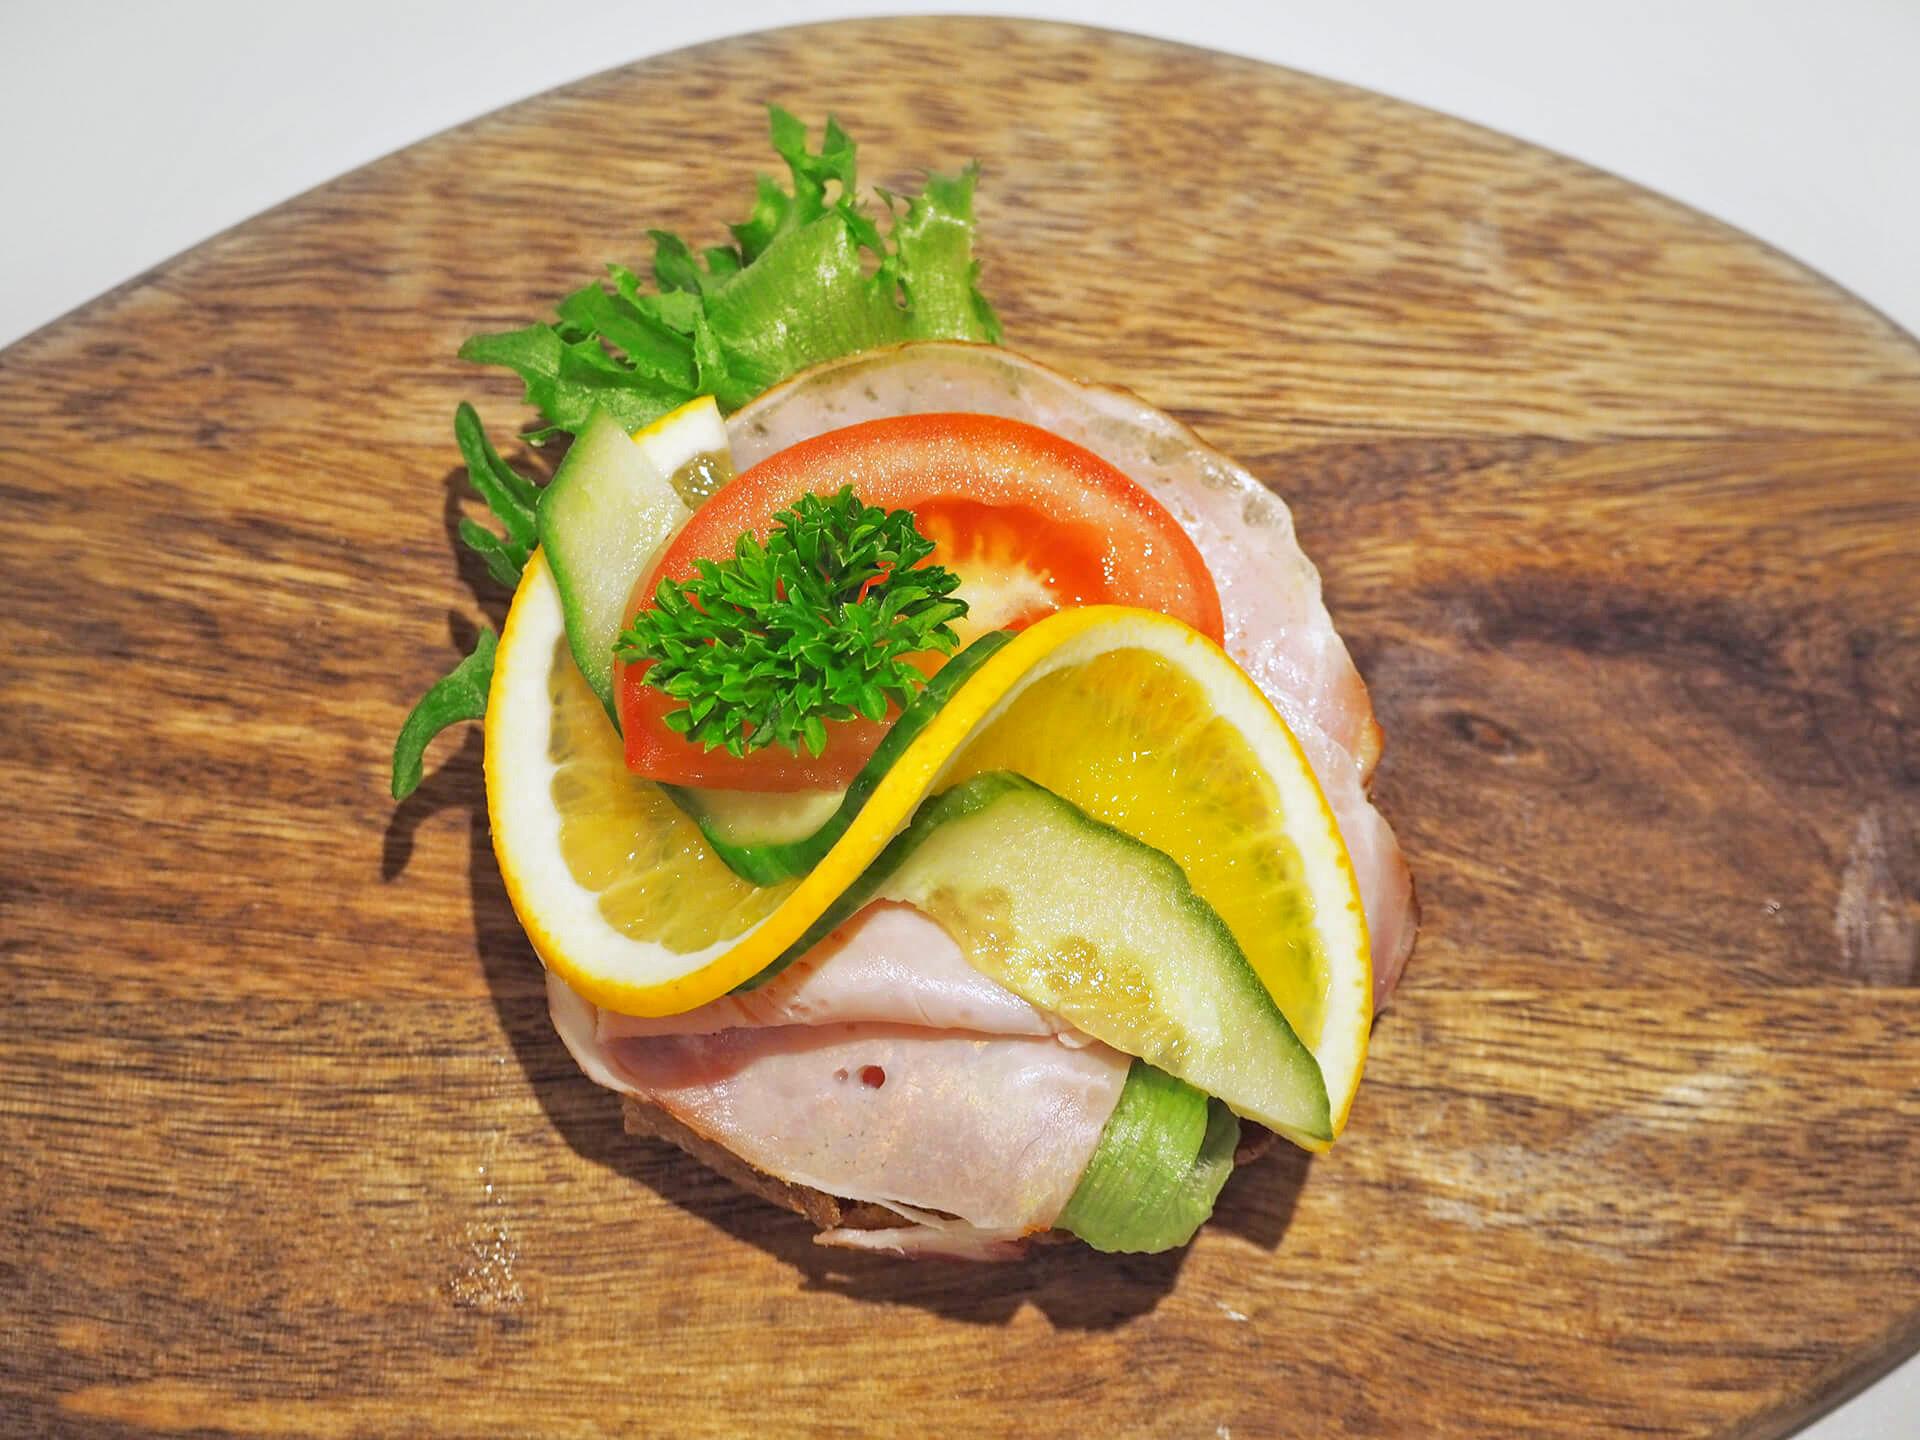 Rundstykker - Røkt svinekam m/ italiensk salat